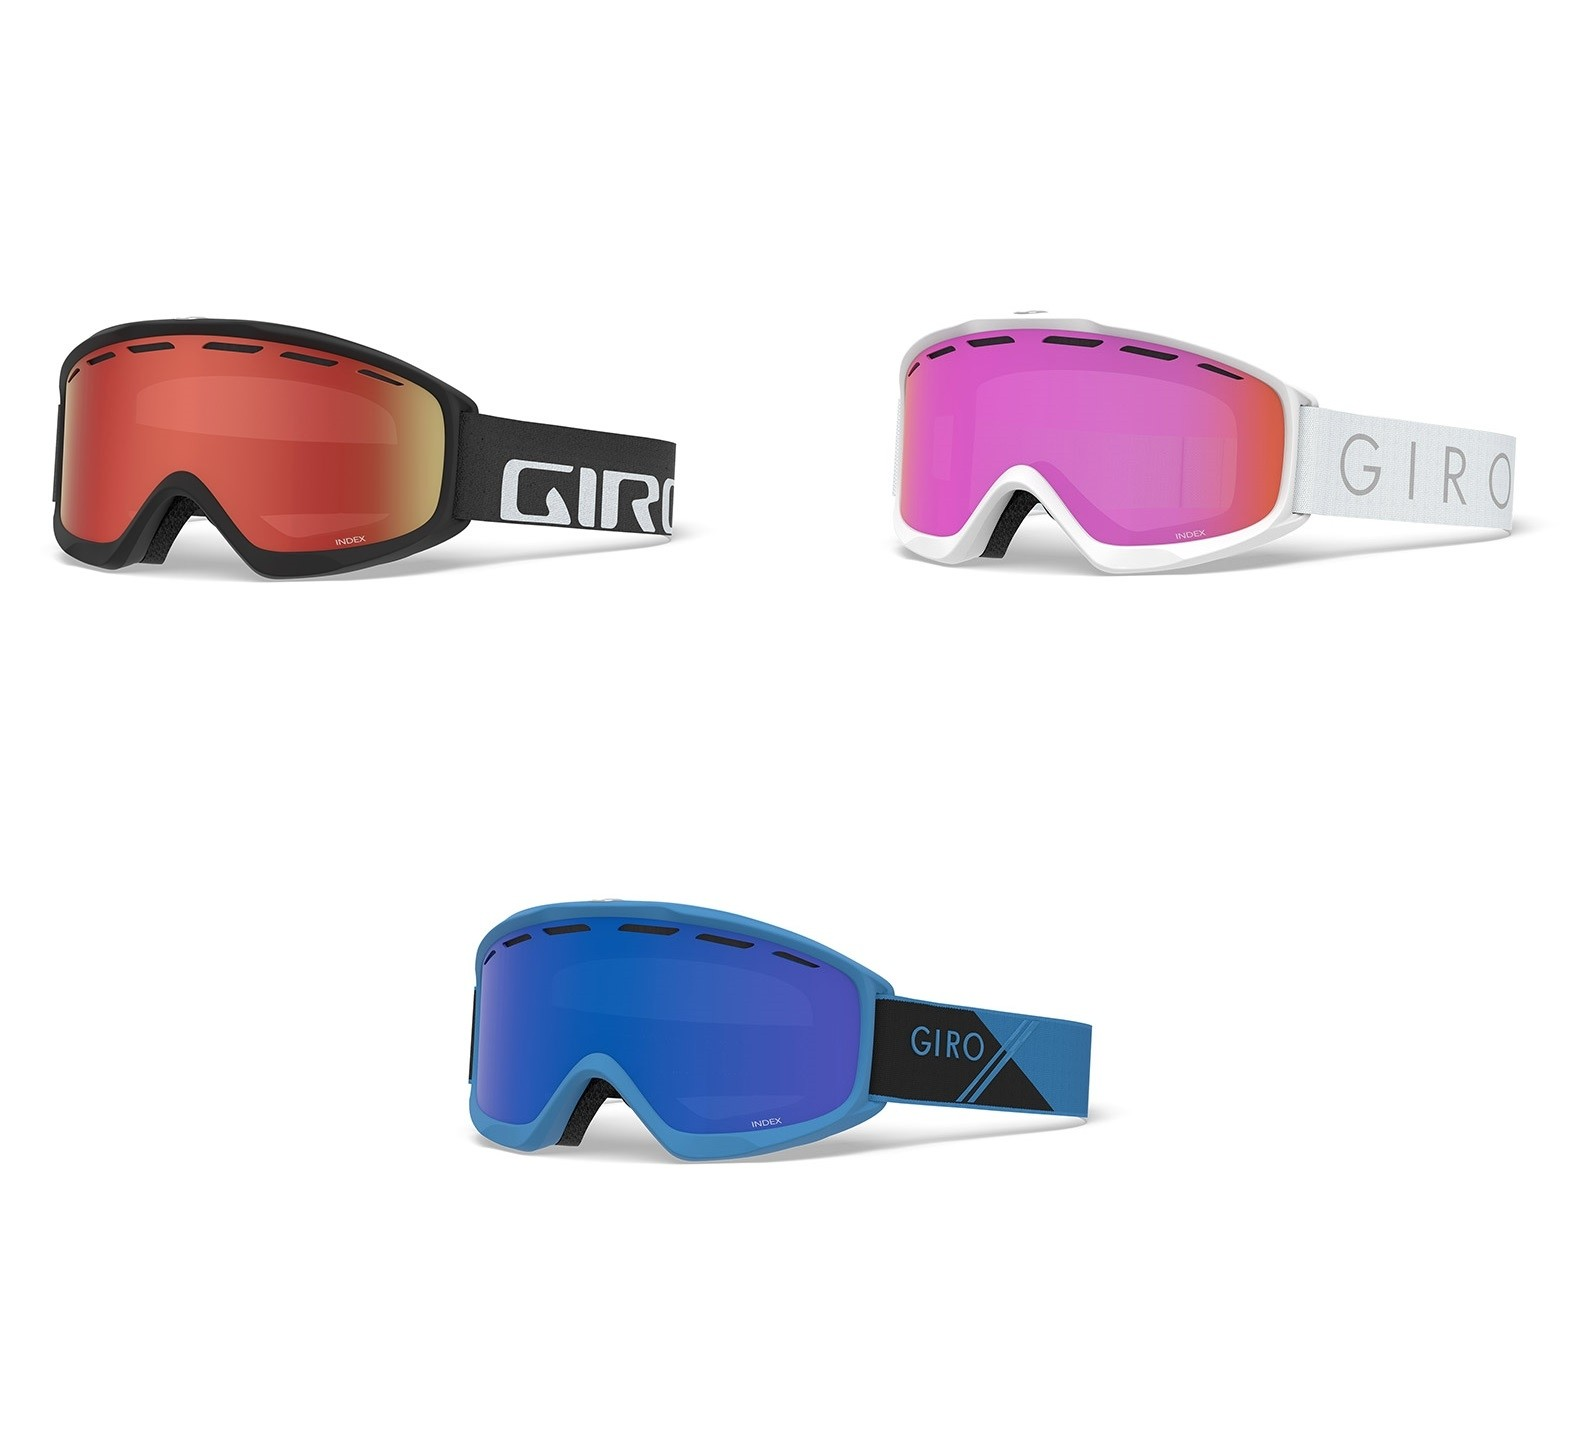 Goggles For Prescription Eye Wear - OTG - Over The Glasses Goggles